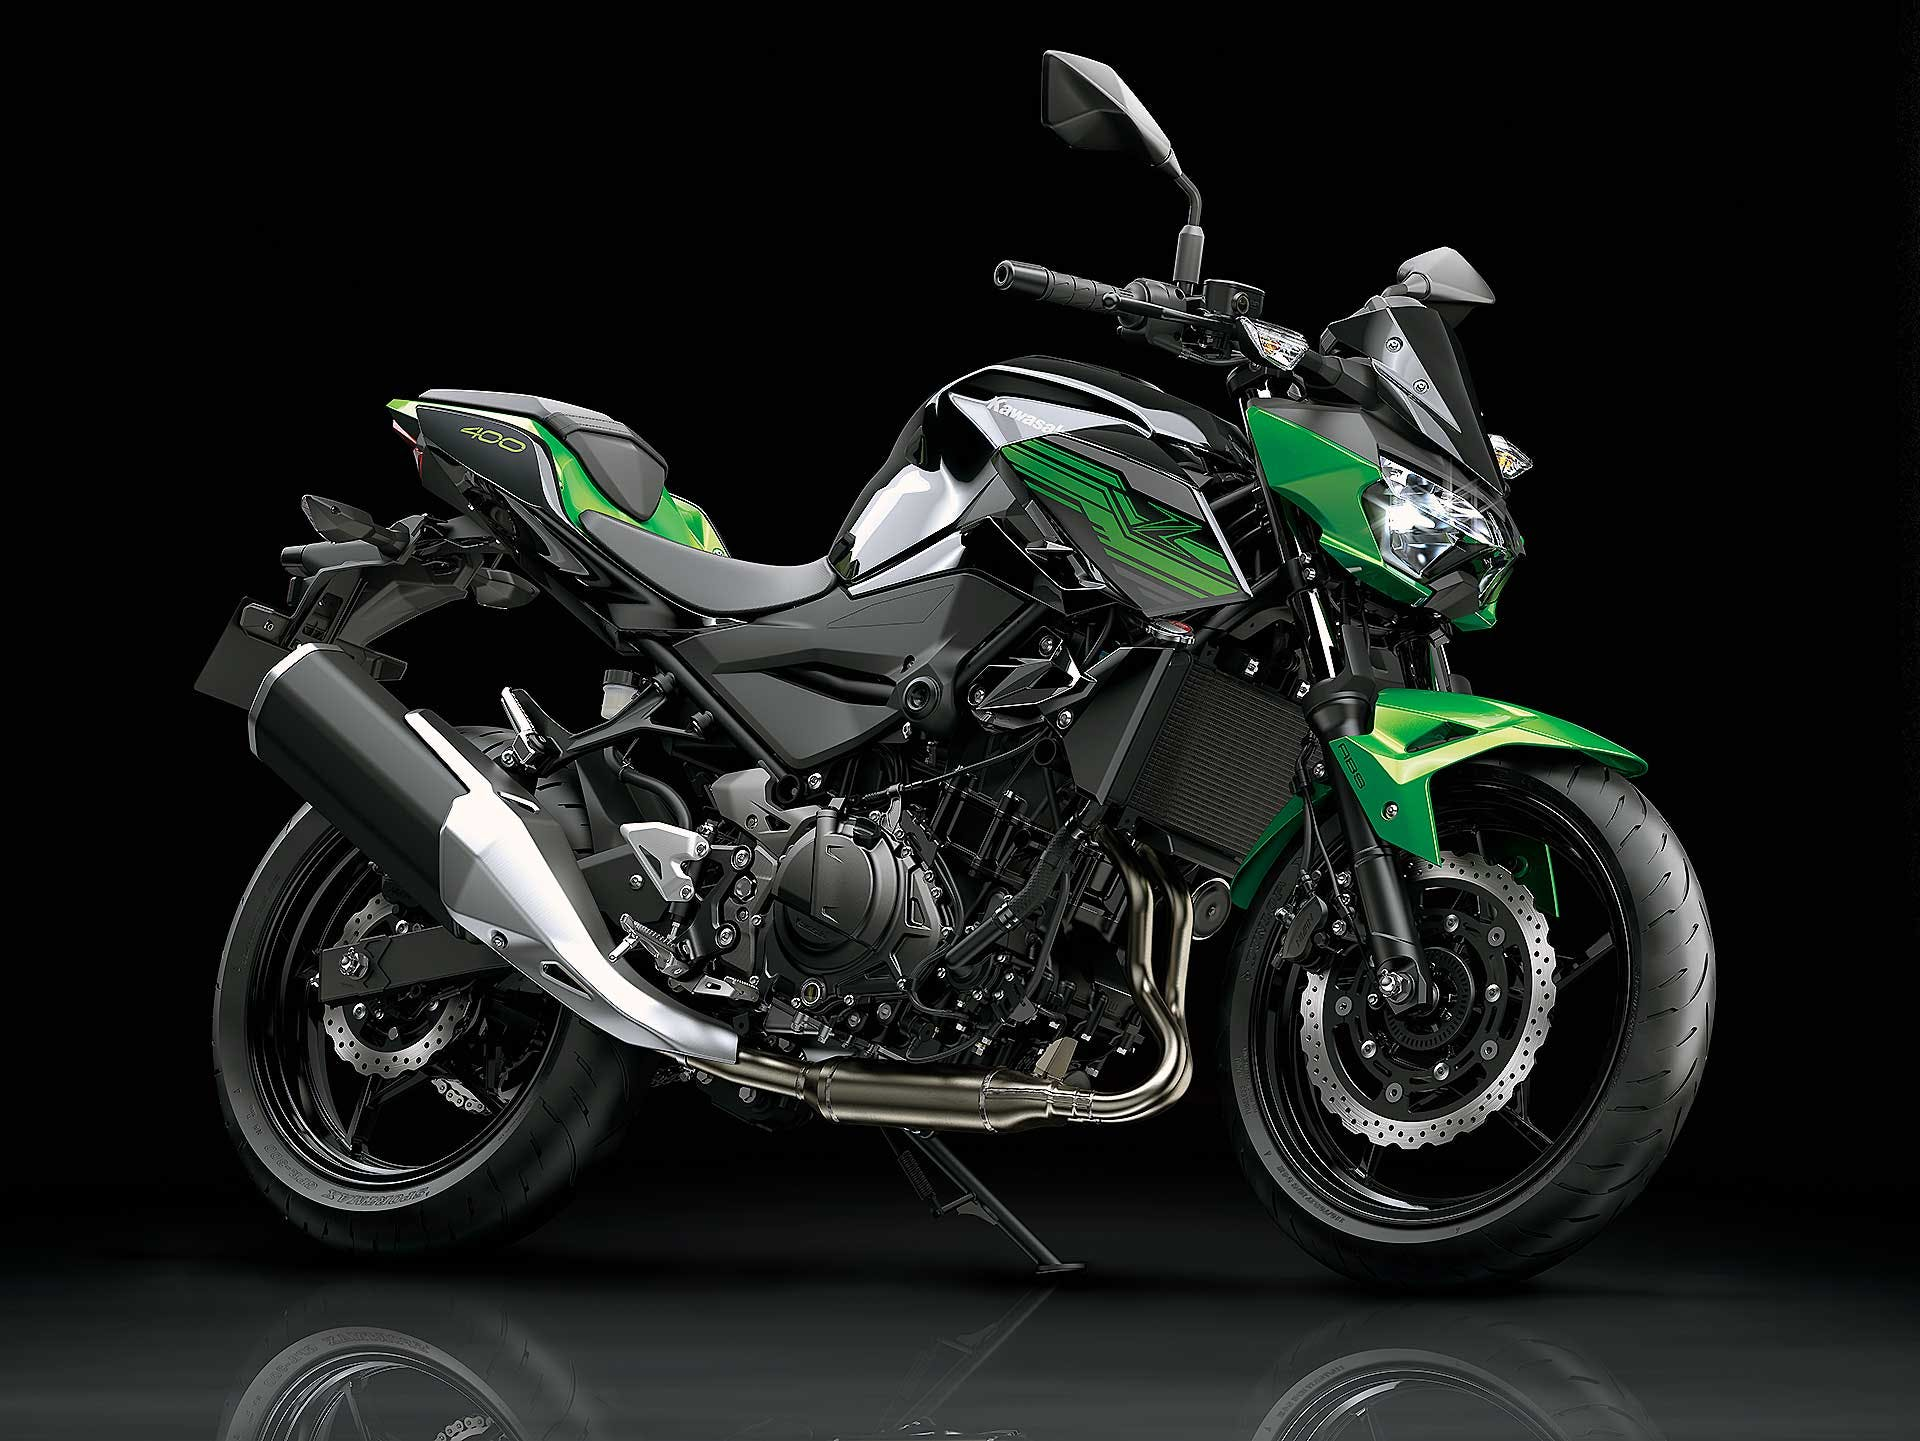 Kawasaki Z400 nera e verde moto per neopatentati A2